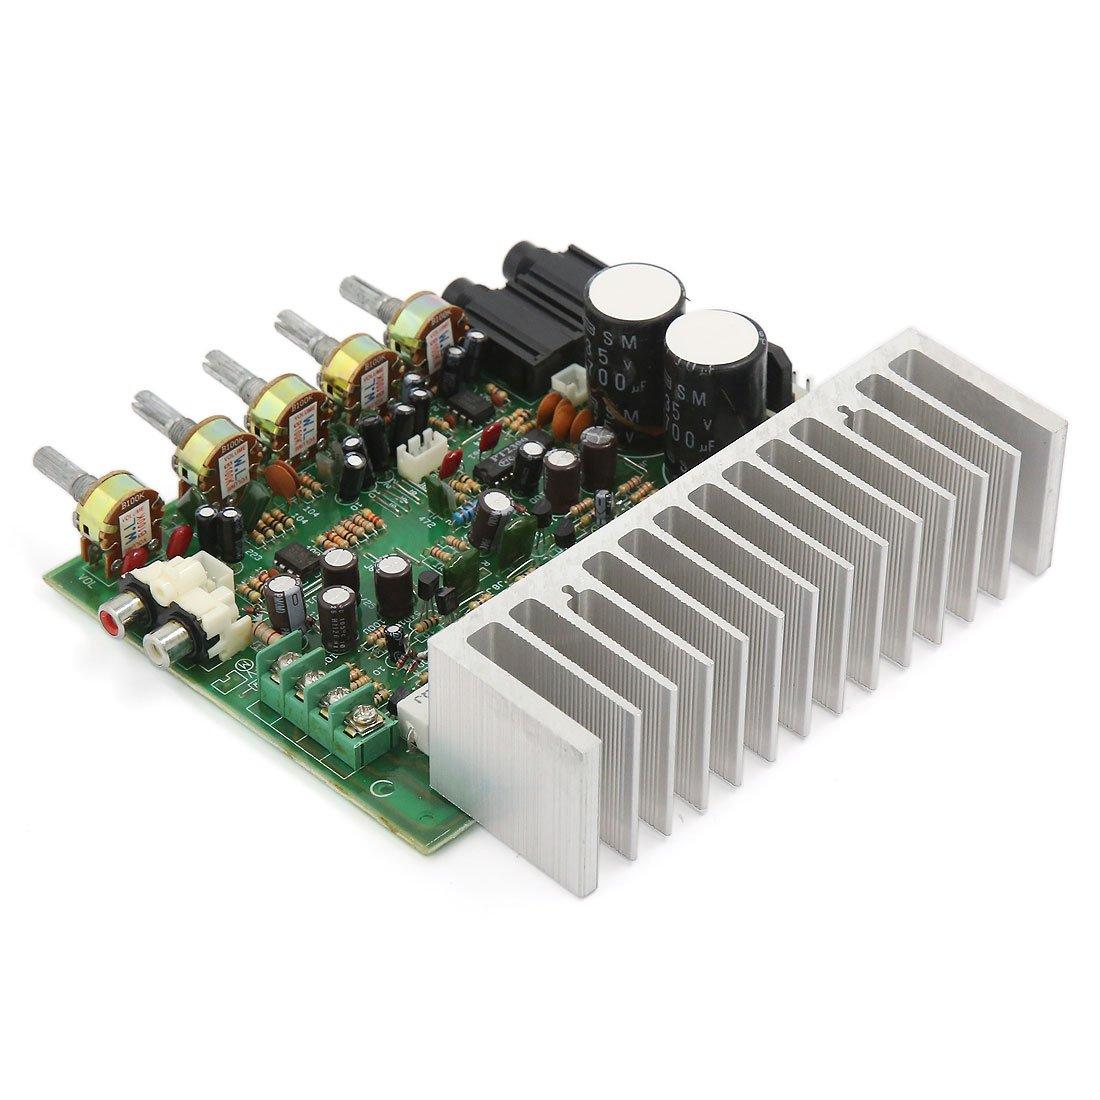 sourcing map AC22-26V 250W+250W LFE Subwoofer Audio Hi-Fi 4 Channel Car Boat Stereo Power Amplifier Board